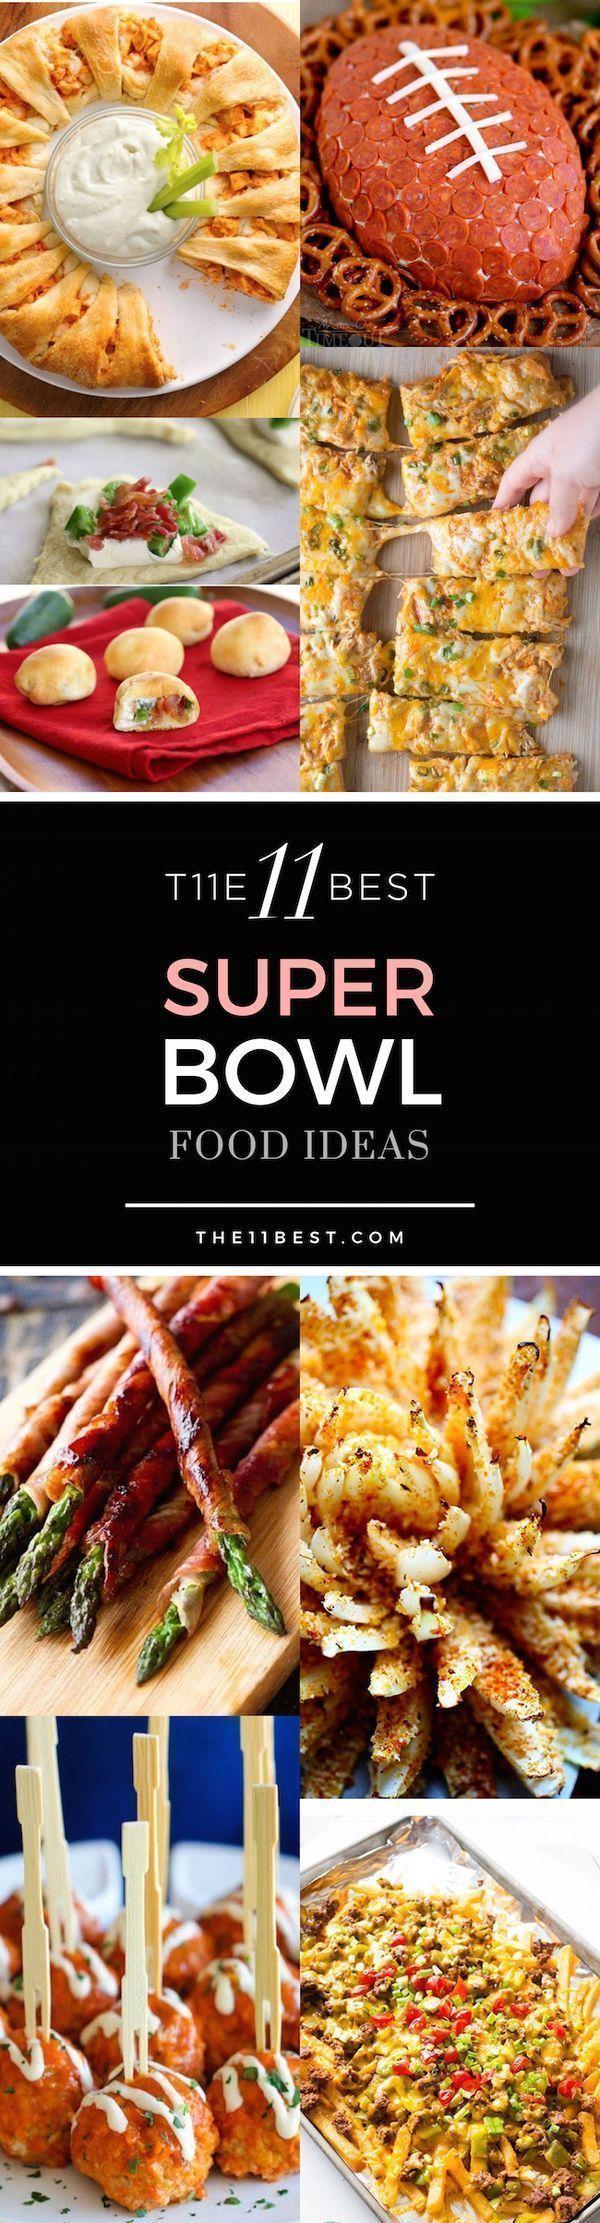 The 11 Best Super Bowl Food Ideas